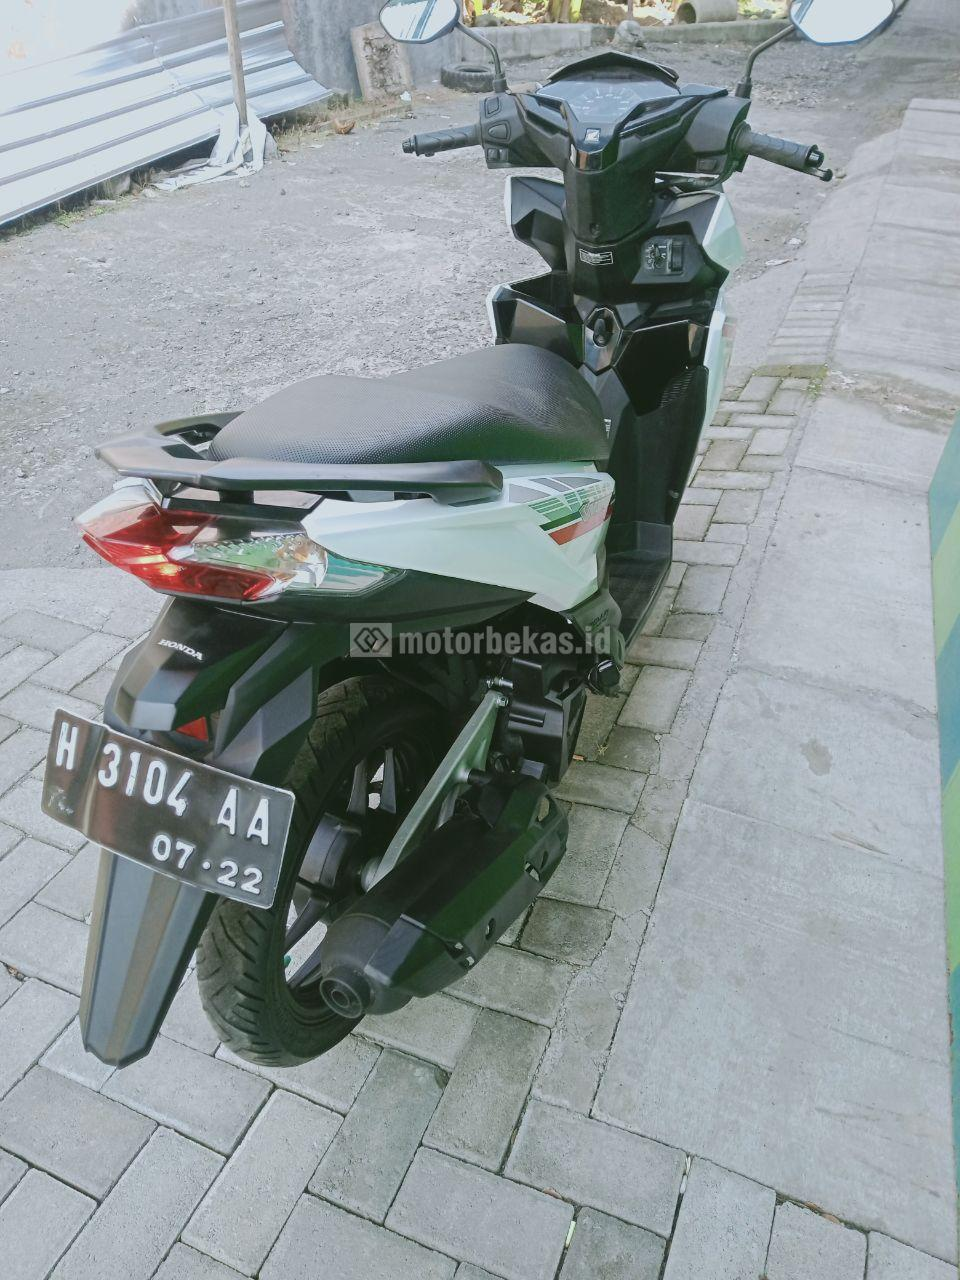 HONDA VARIO 125 FI 4121 motorbekas.id